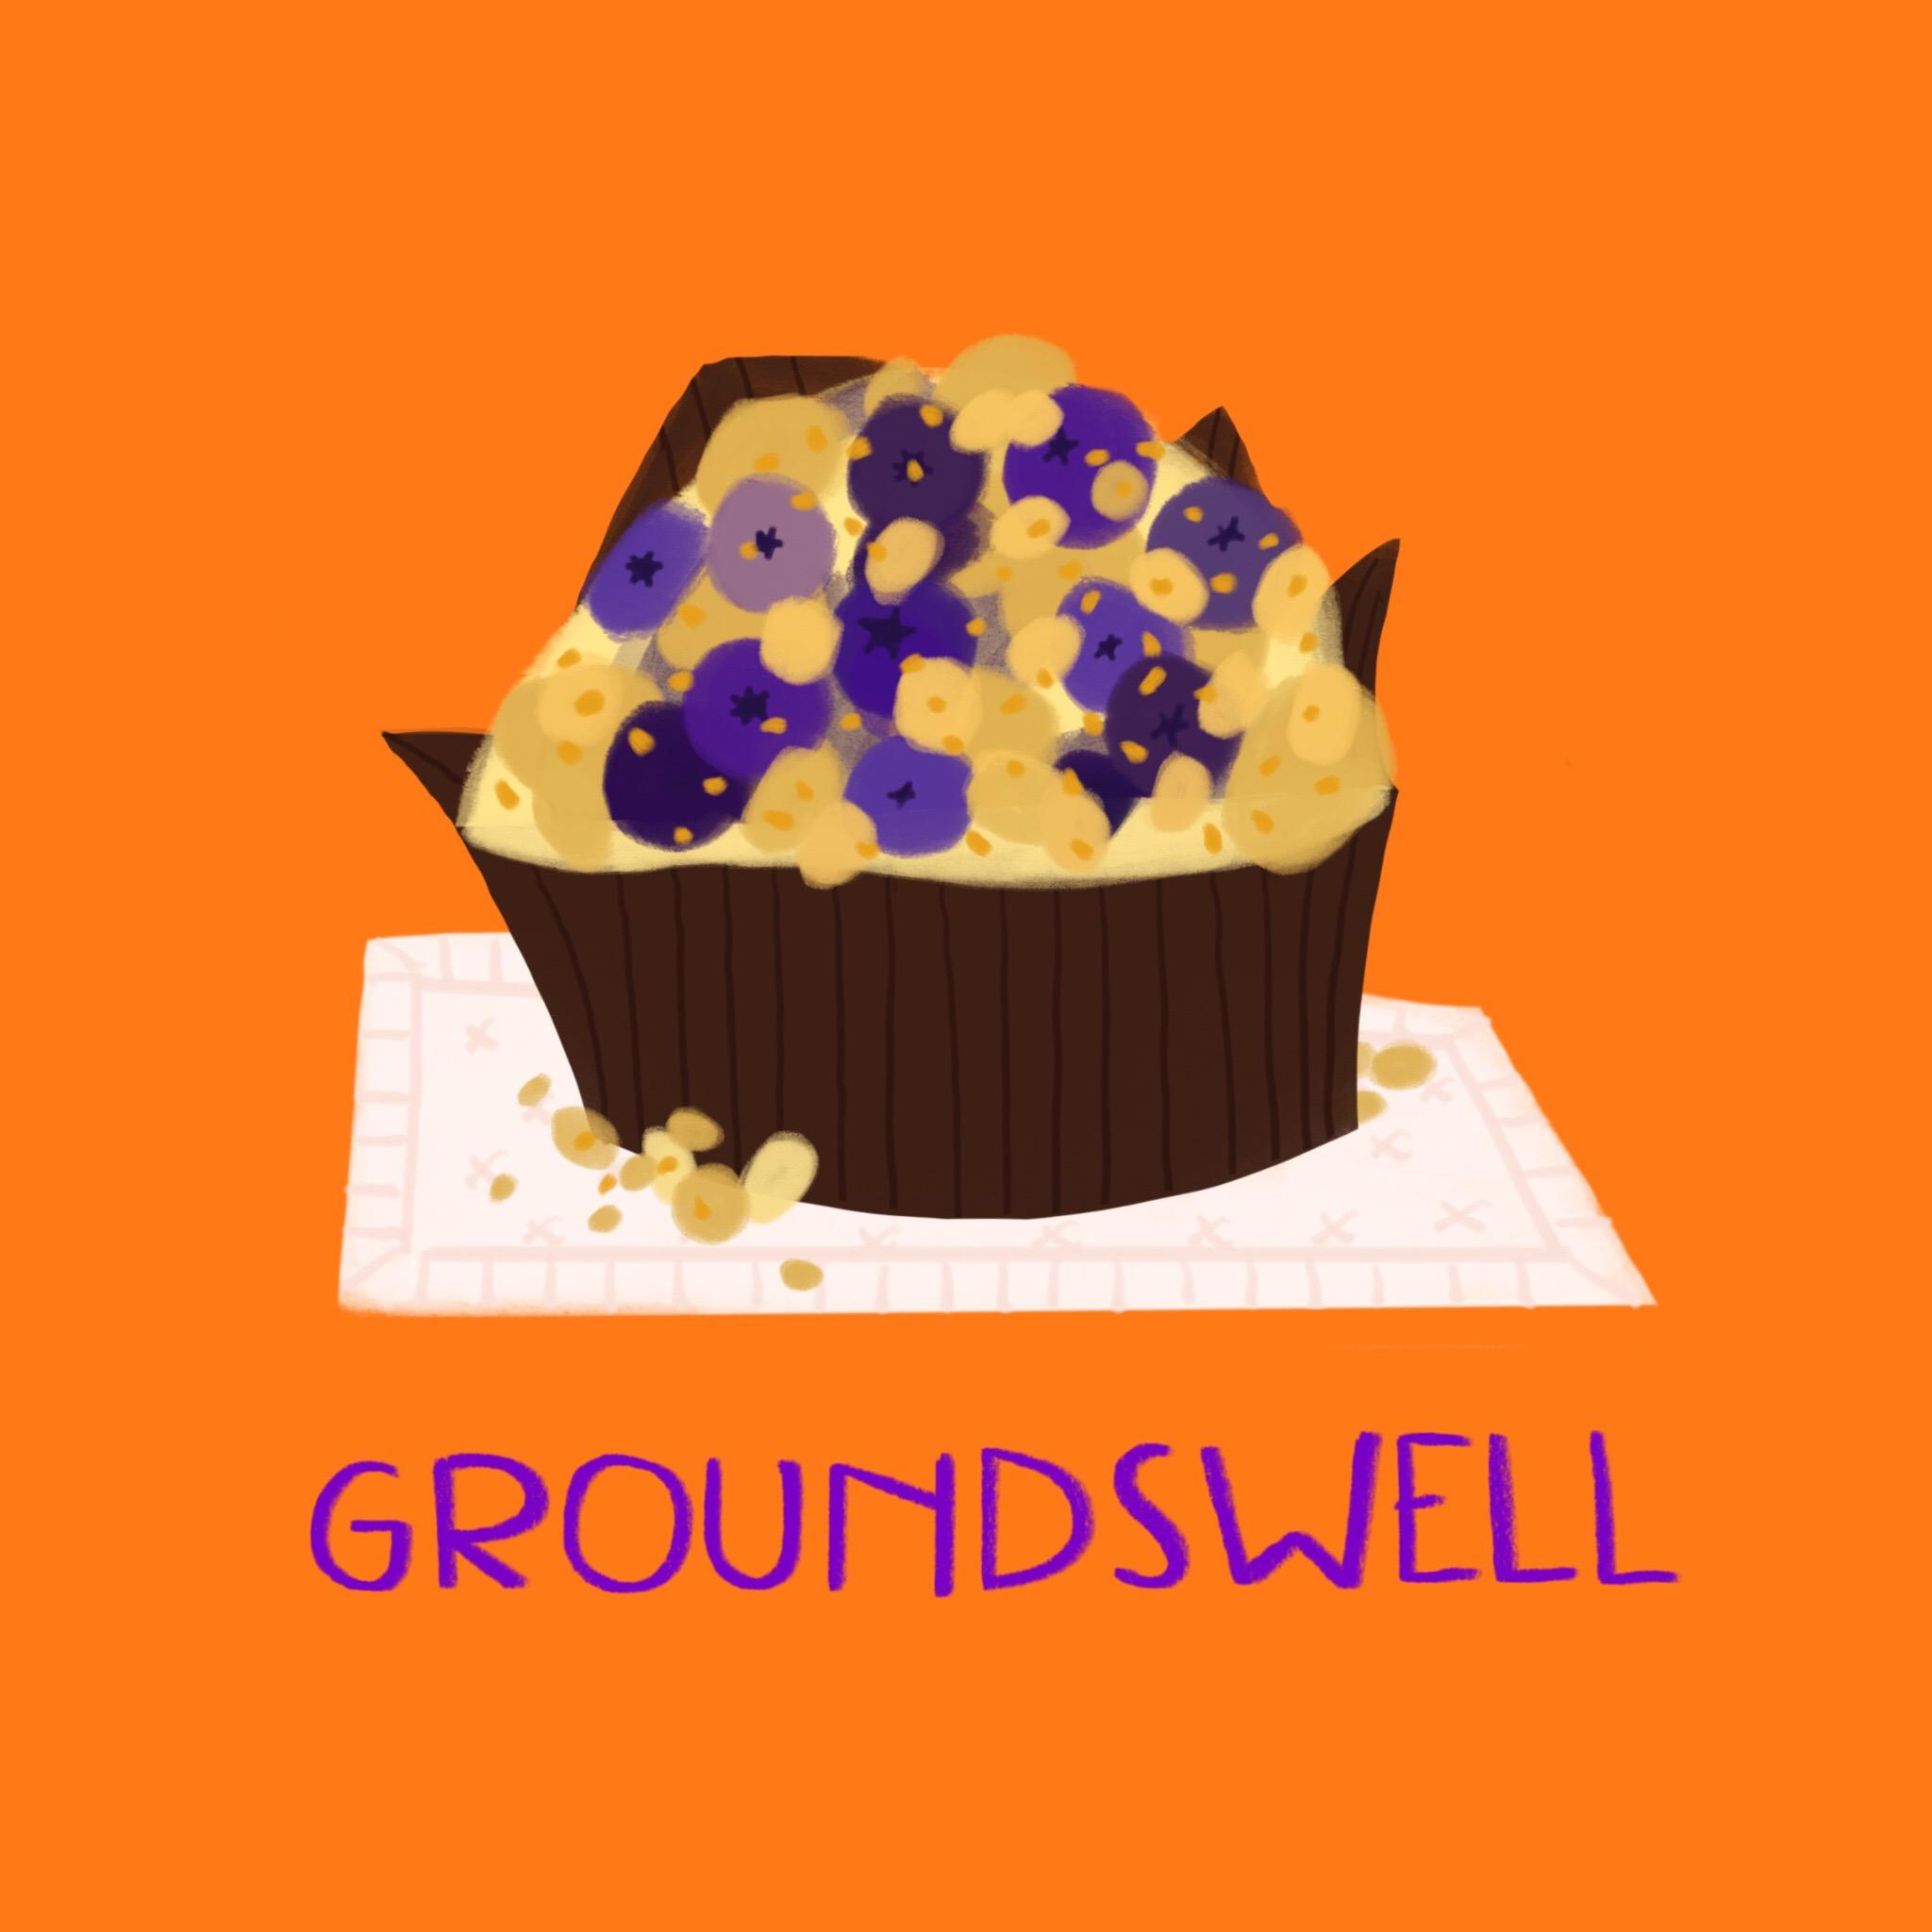 95_-_Groundswell.jpg